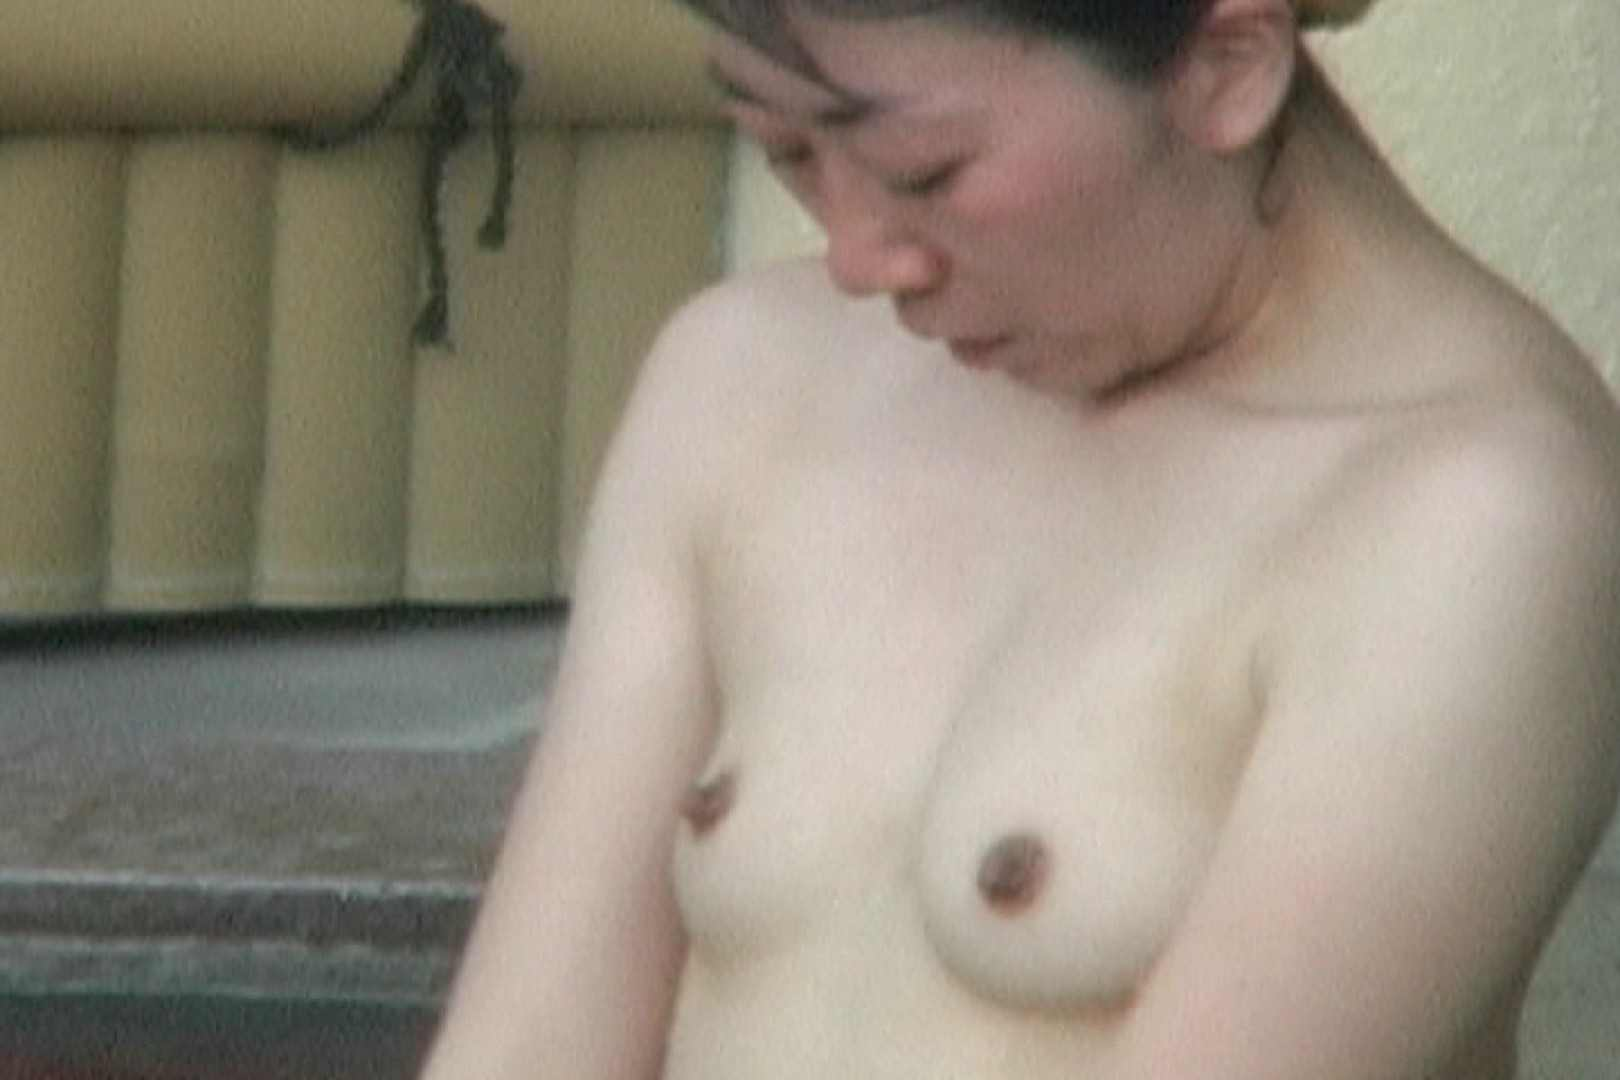 Aquaな露天風呂Vol.594 盗撮師作品  79pic 12